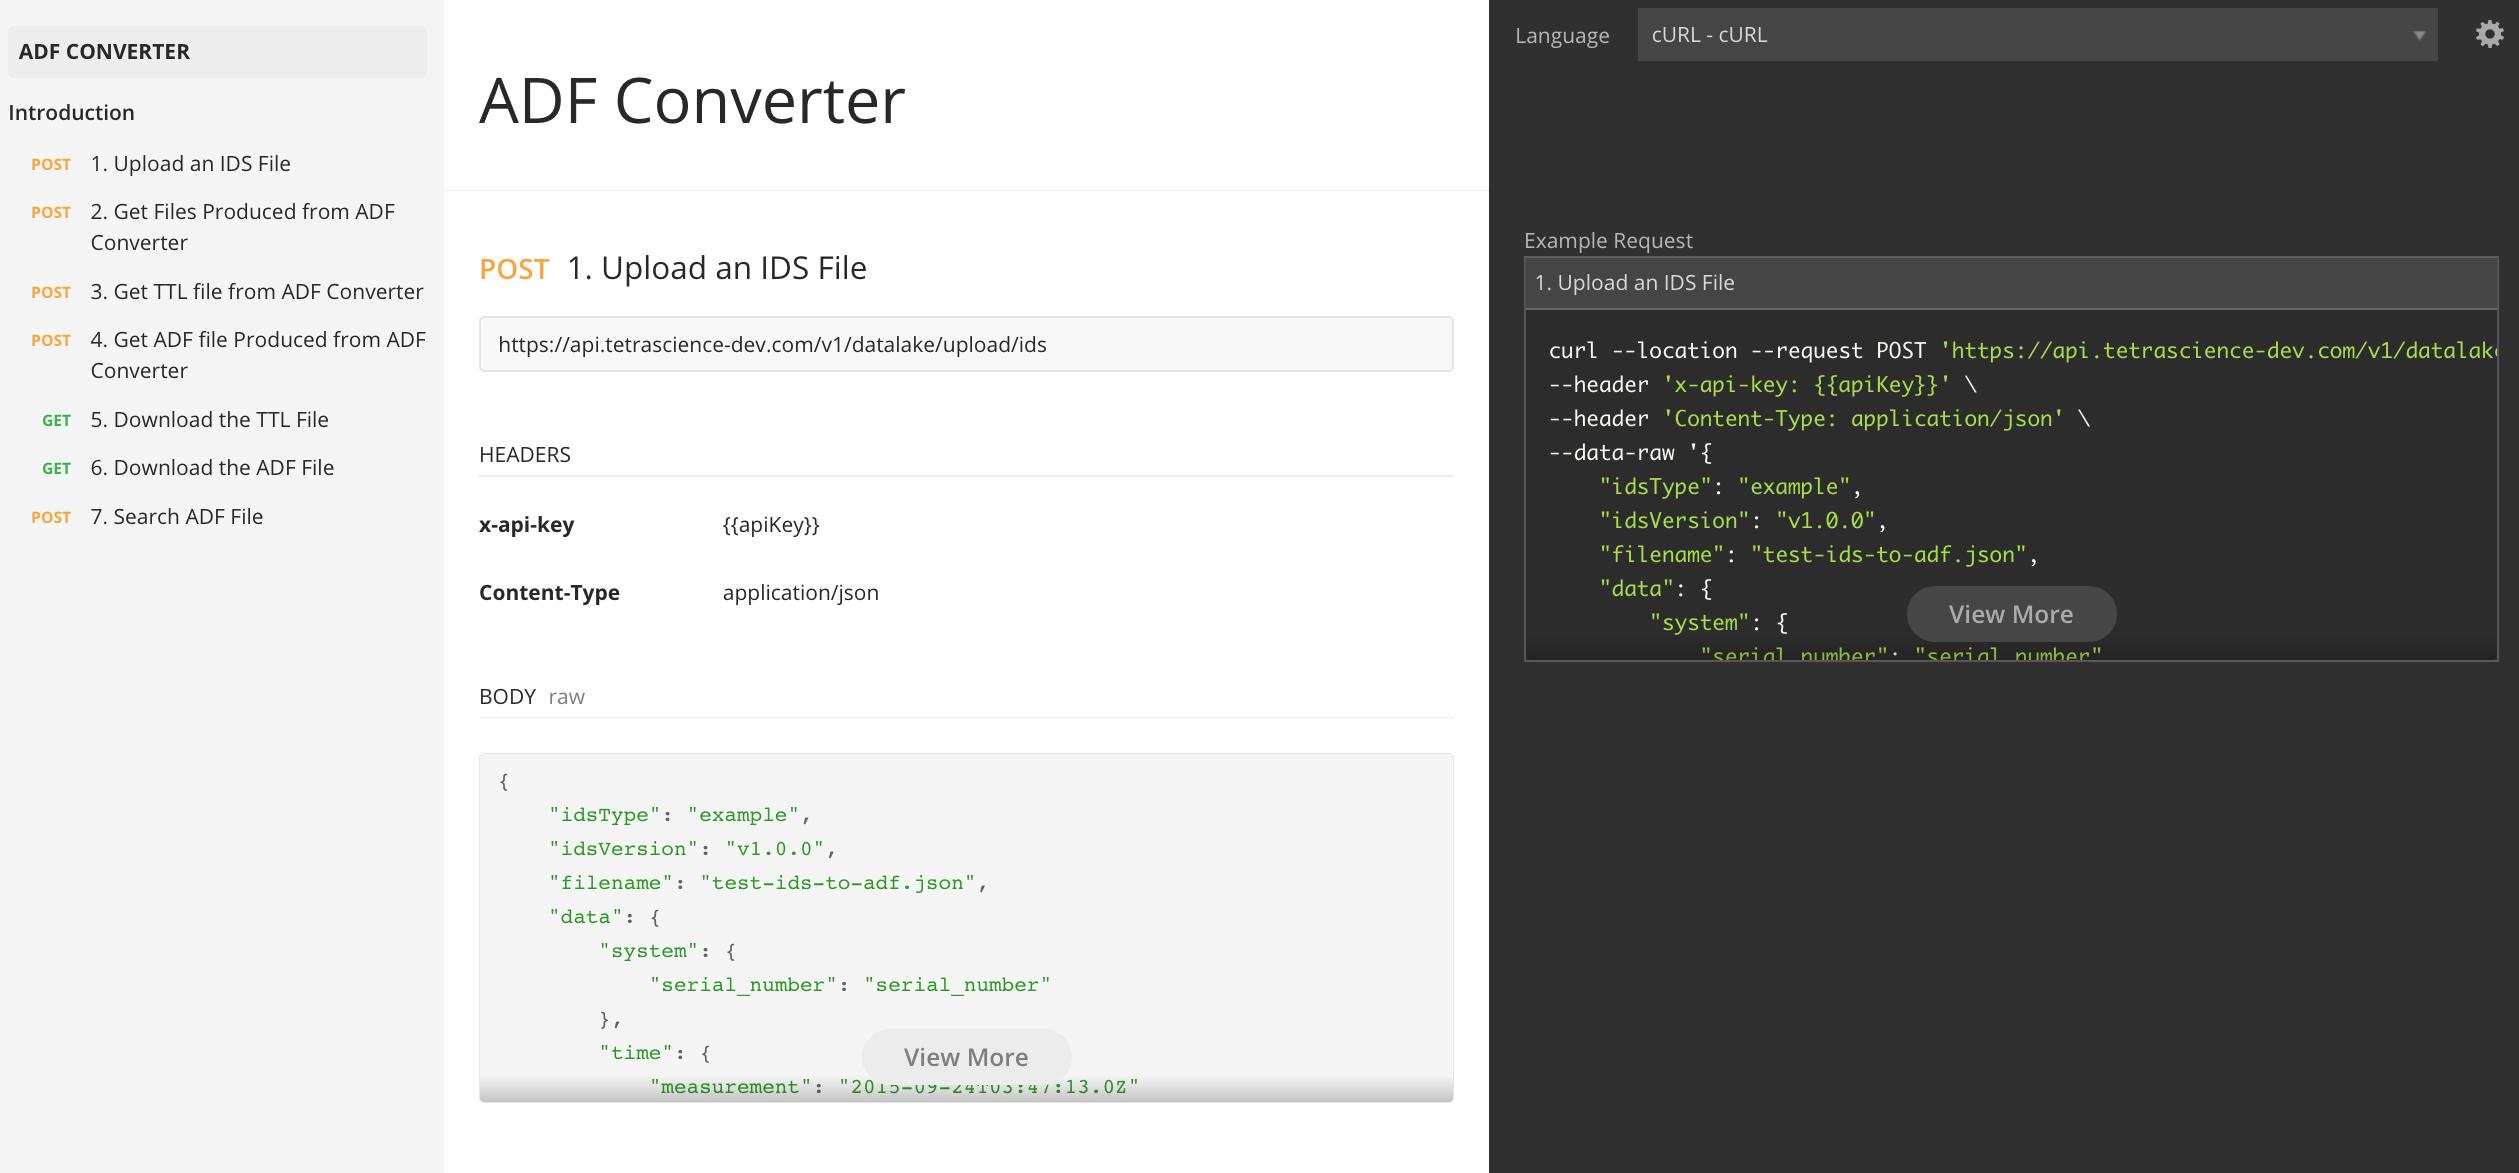 ADF Converter API